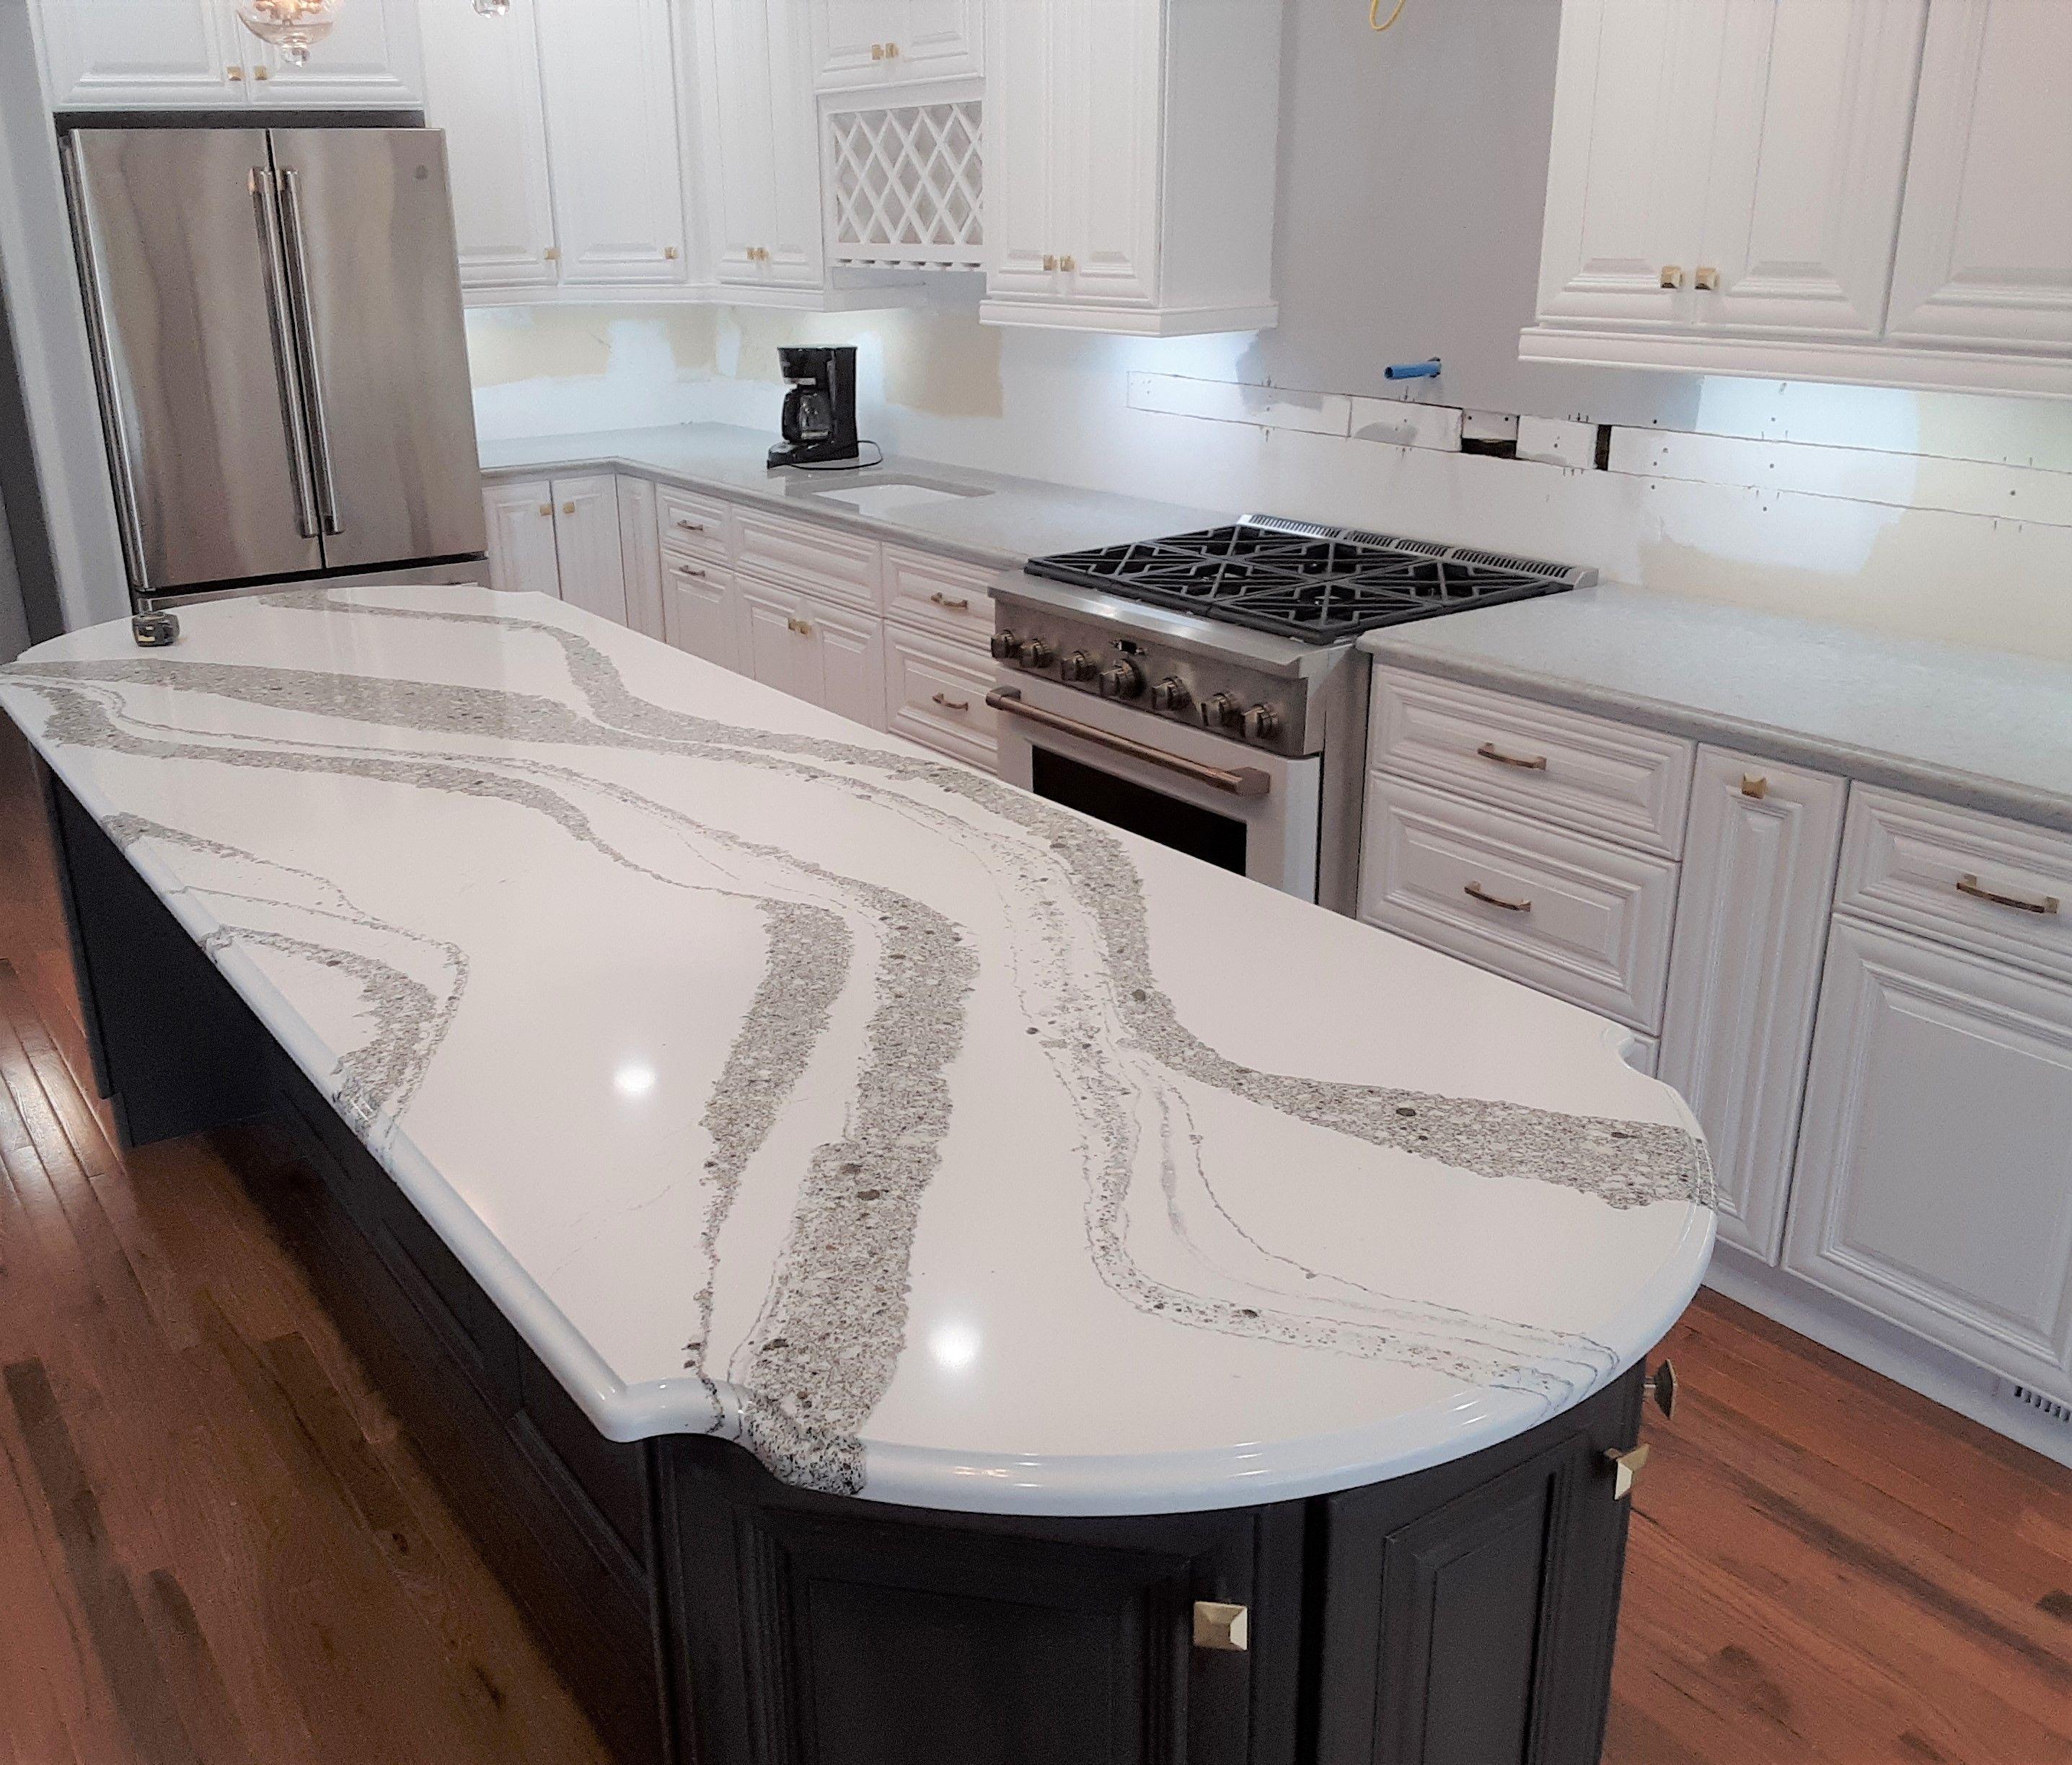 Annicca By Cambria Quartz With An Ogee Edge Profile Gorgeous Centerpiece Stone Interior Custom Countertops Quartz Countertops